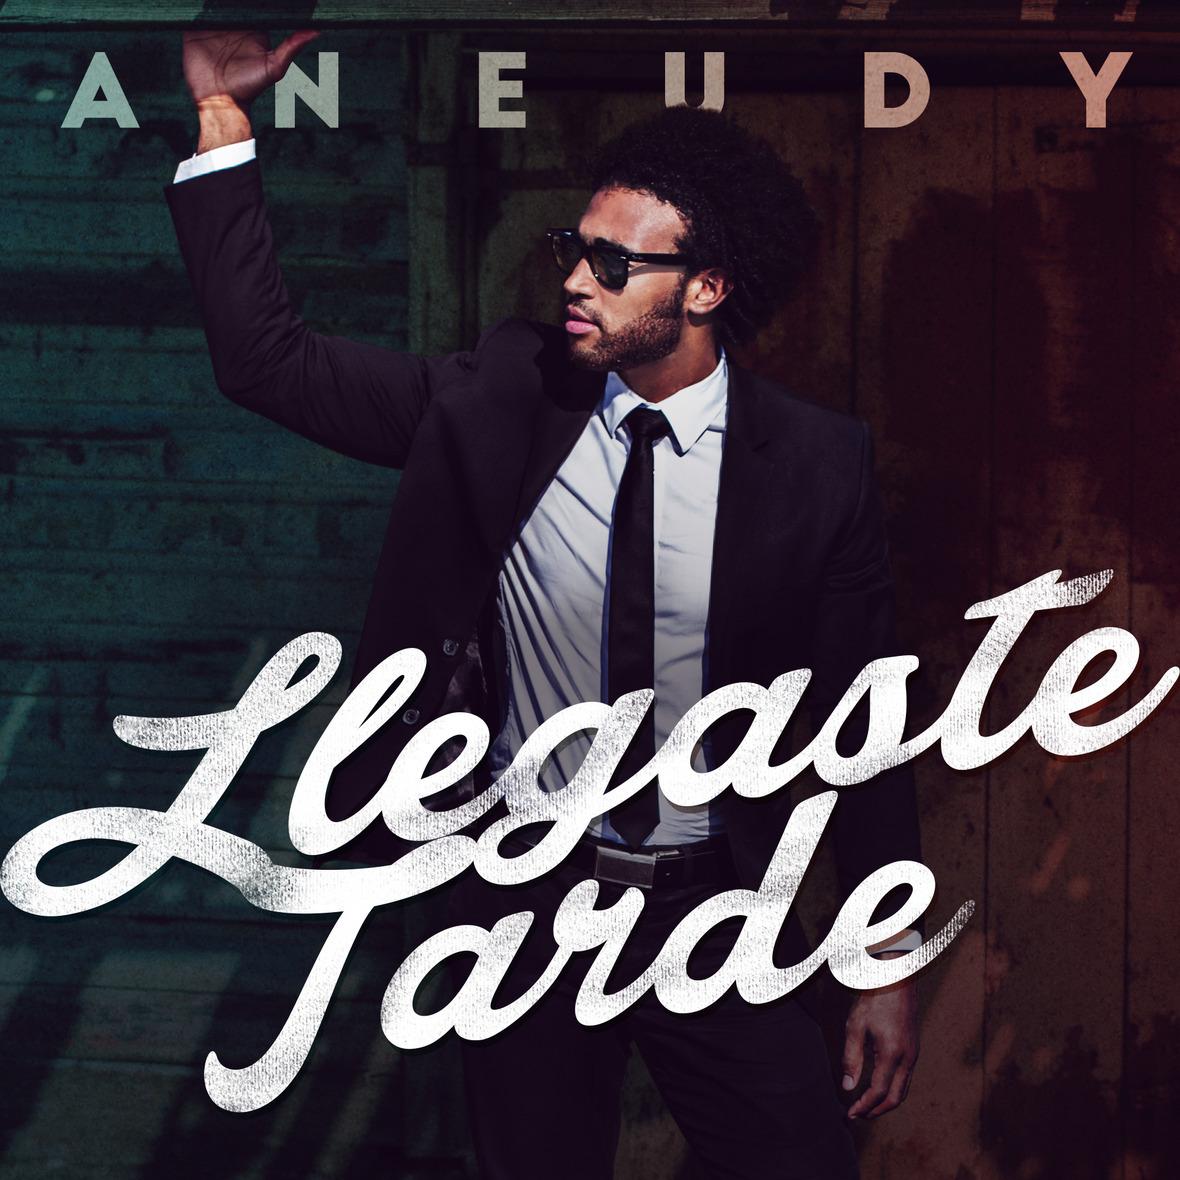 Aneudy - LLegaste Tarde